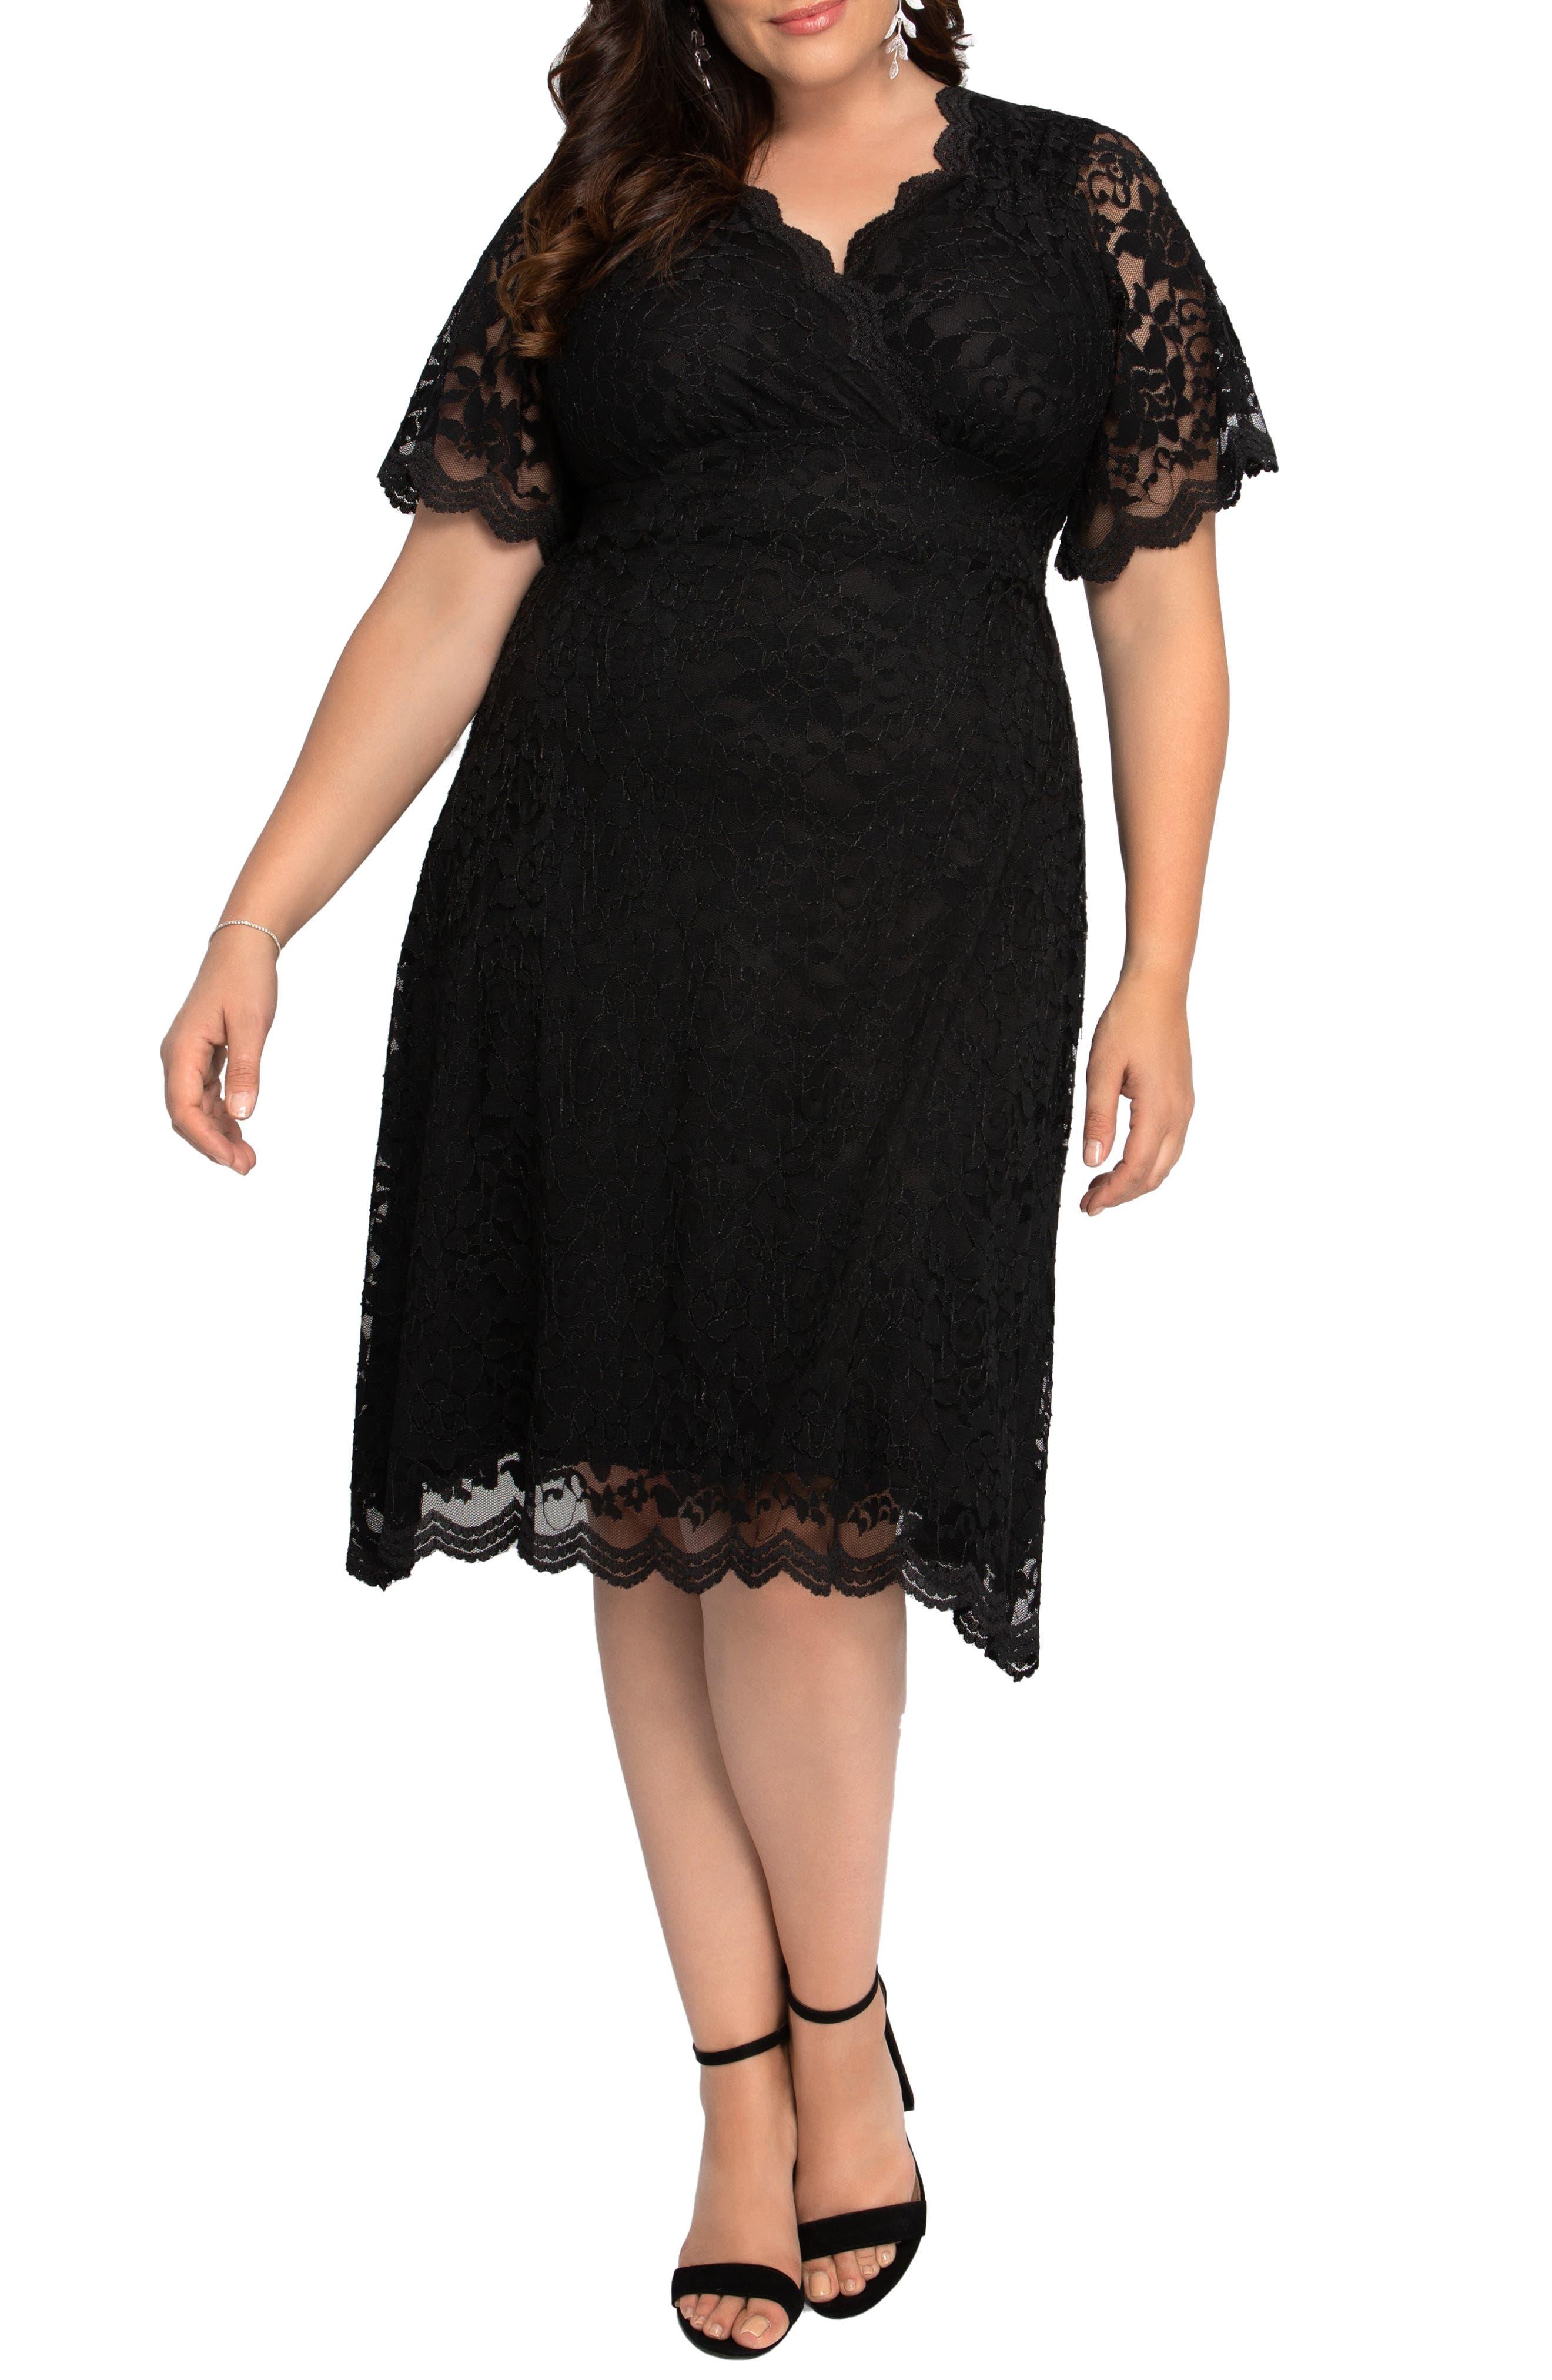 Retro Glam Lace Cocktail Dress